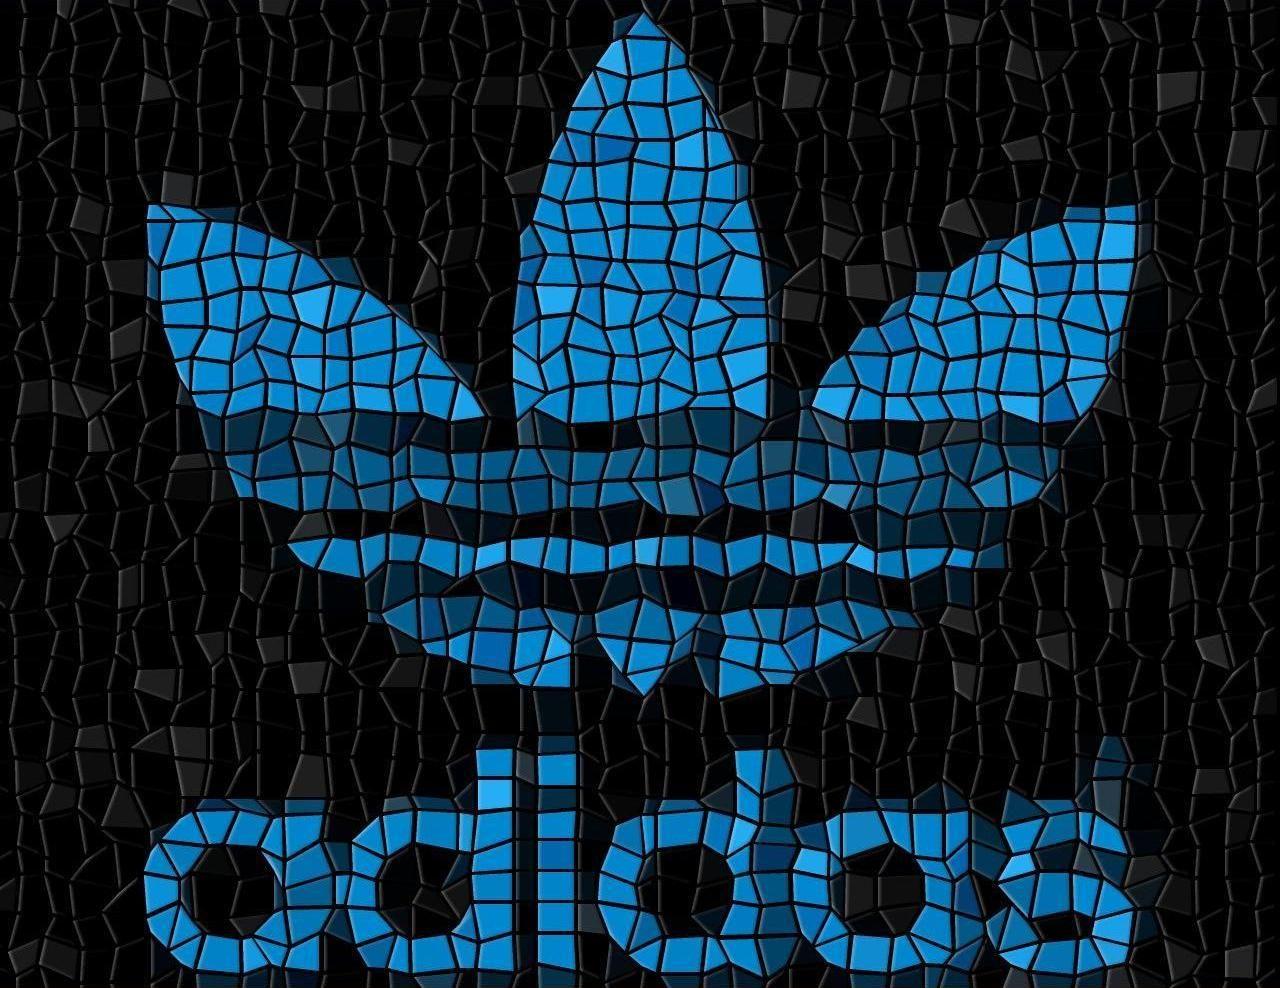 Good Wallpaper High Quality Adidas - 05a541d7f58e0ad38fb67655f4dd83b2  Pictures_56139.jpg